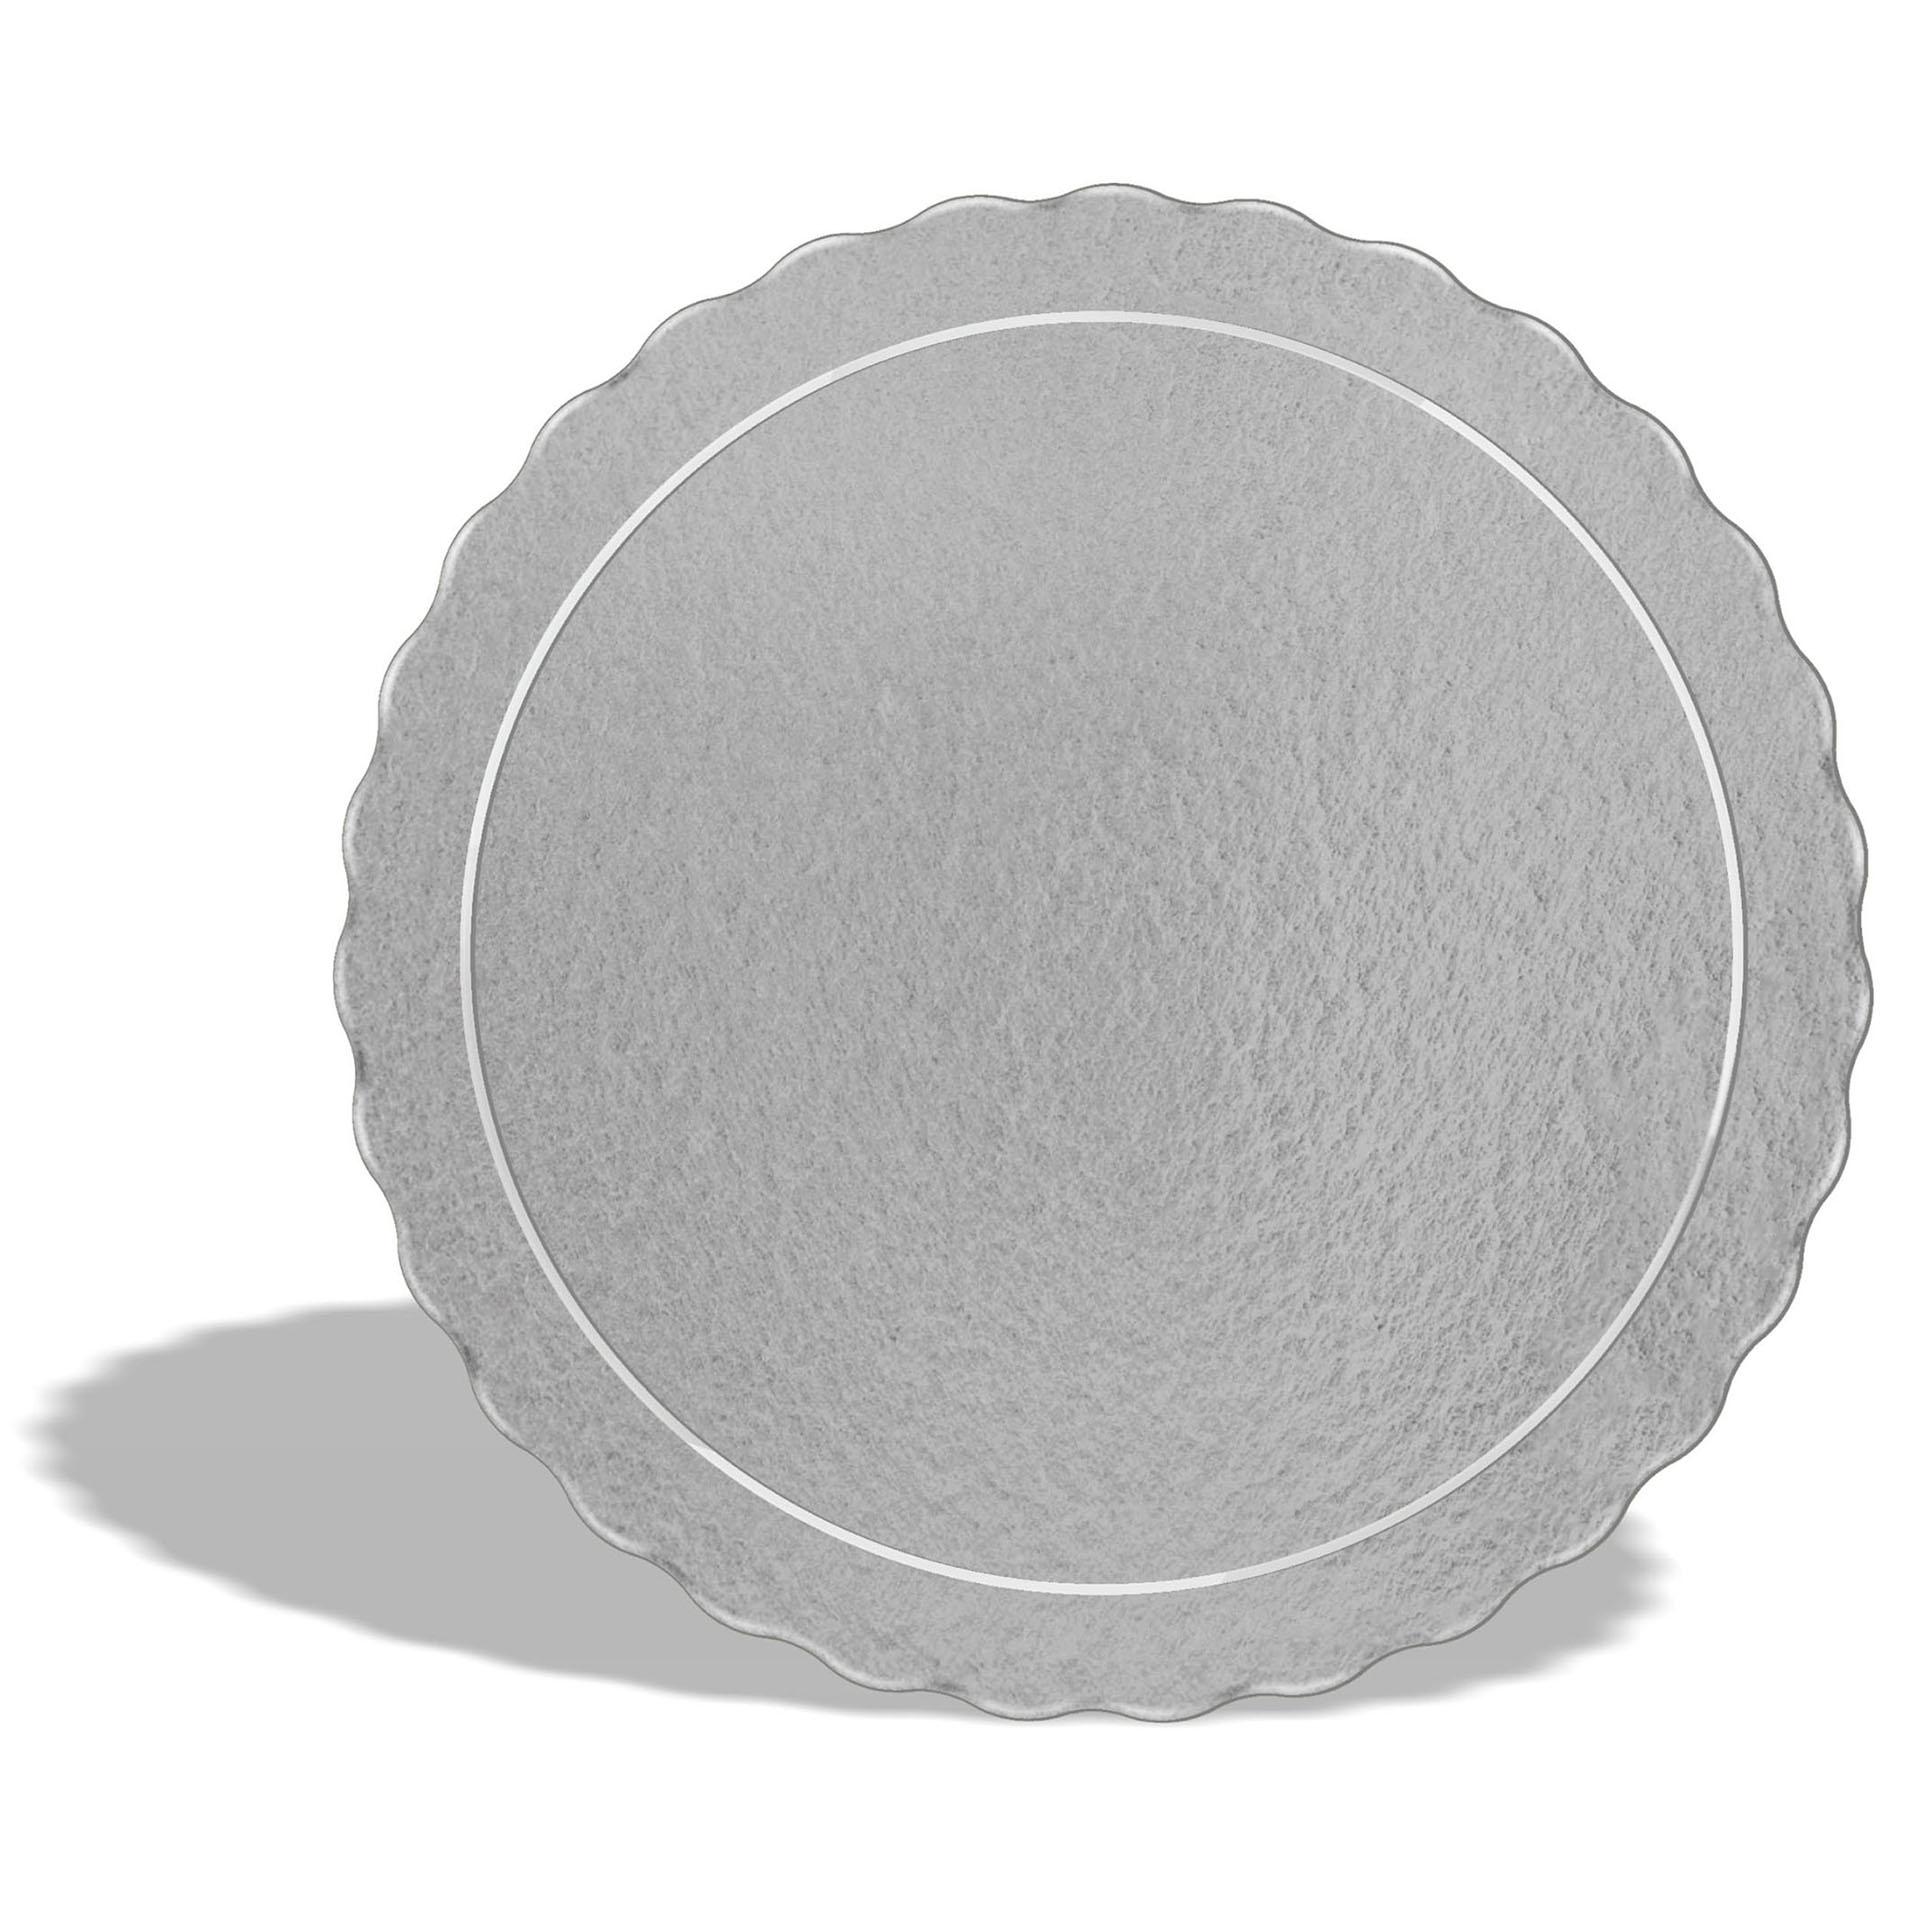 Kit 50 Bases Laminadas Para Bolo, Cake Board, 20 e 24cm - Prata